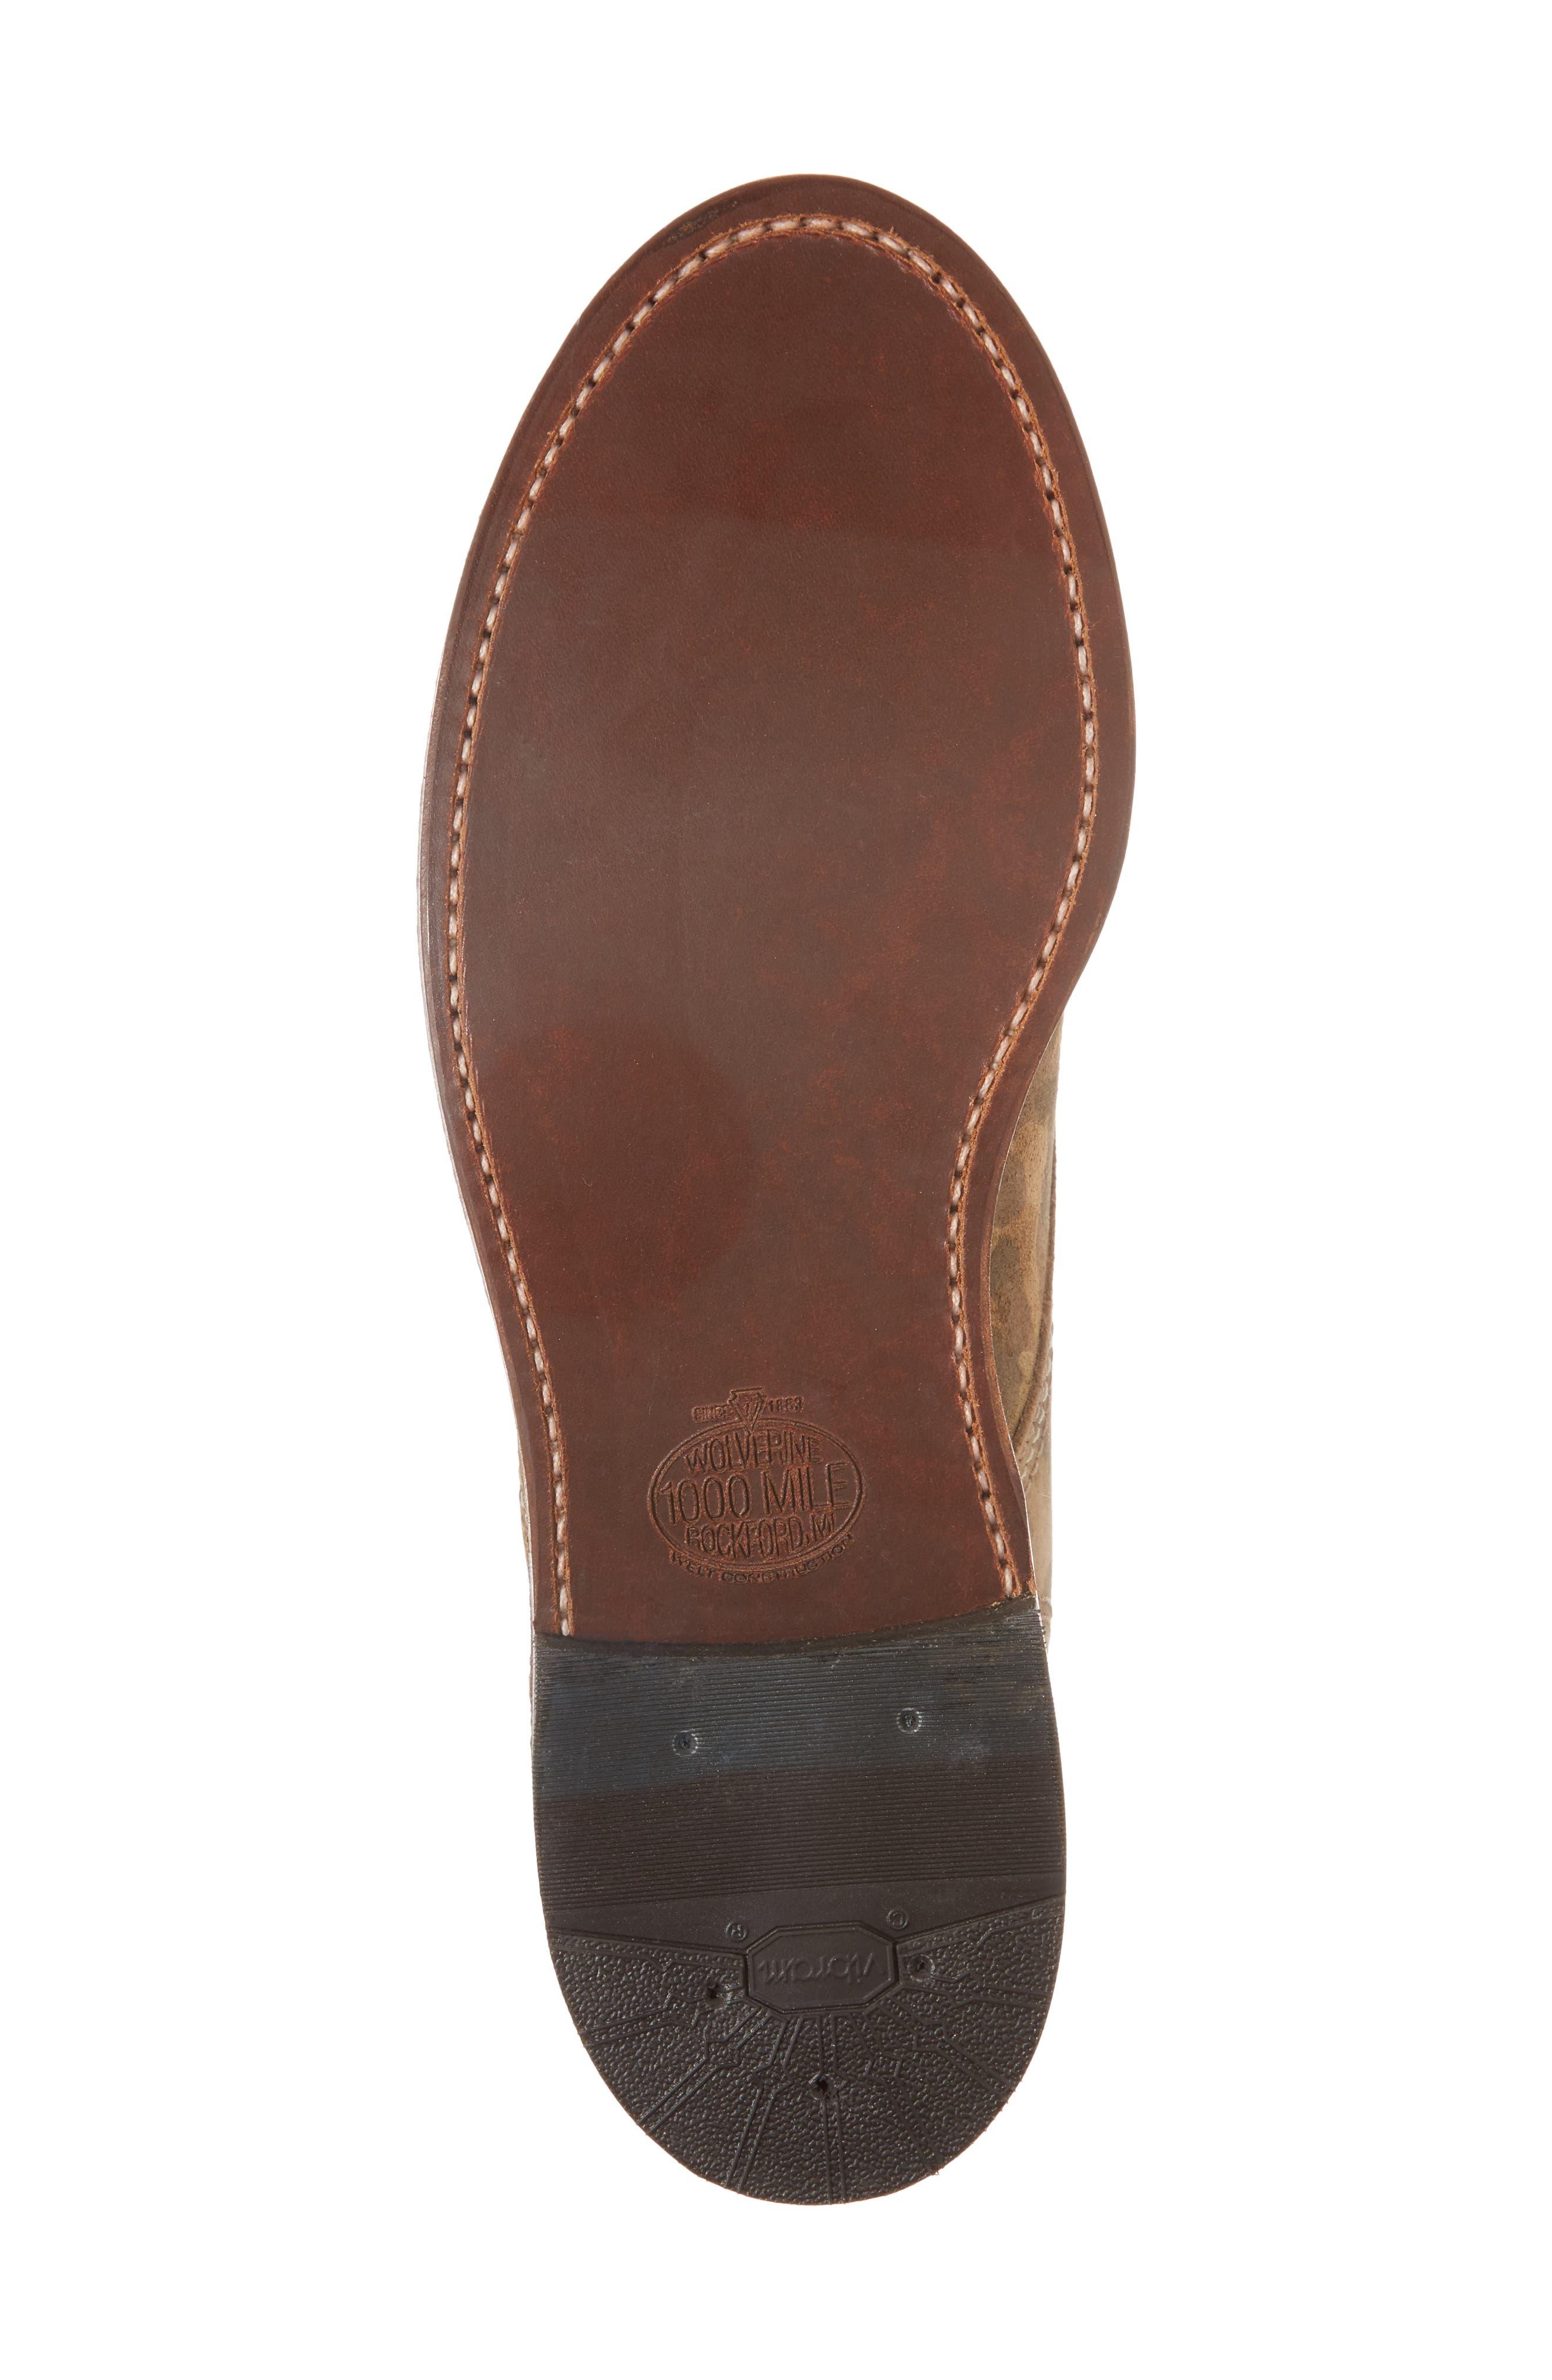 1000 Mile Original Boot,                             Alternate thumbnail 6, color,                             350